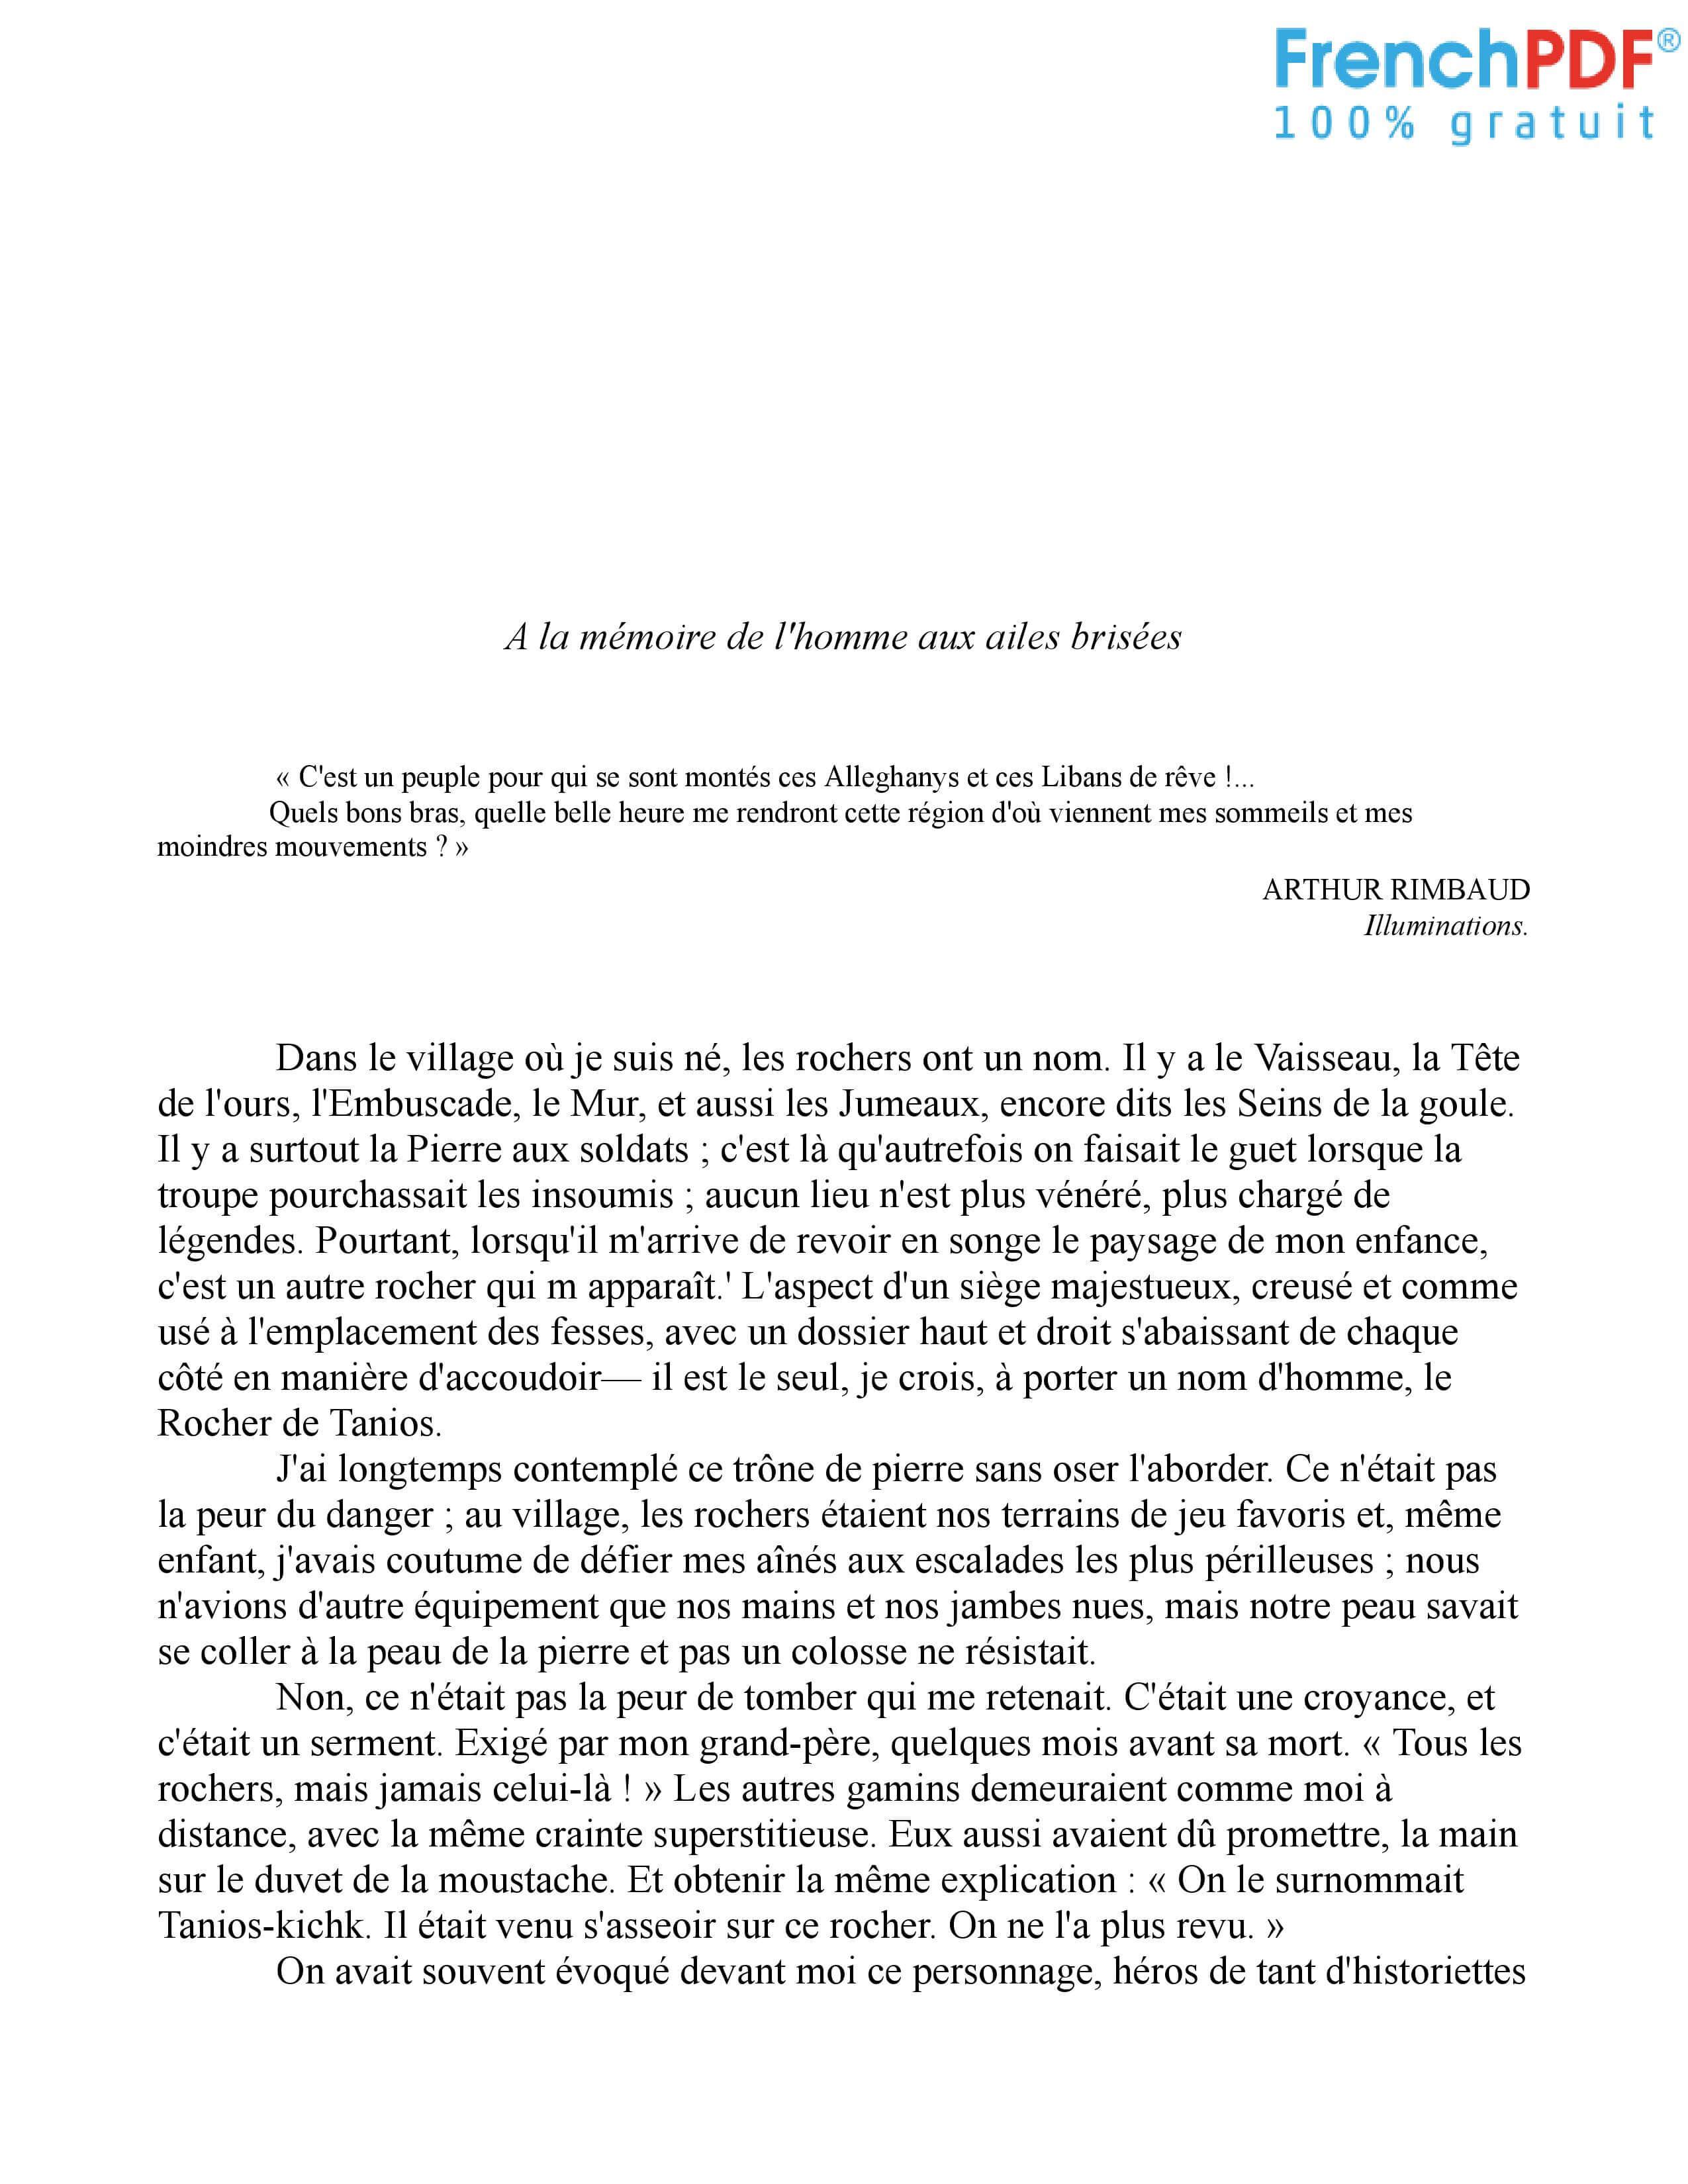 Le Rocher de Tanios PDF 1